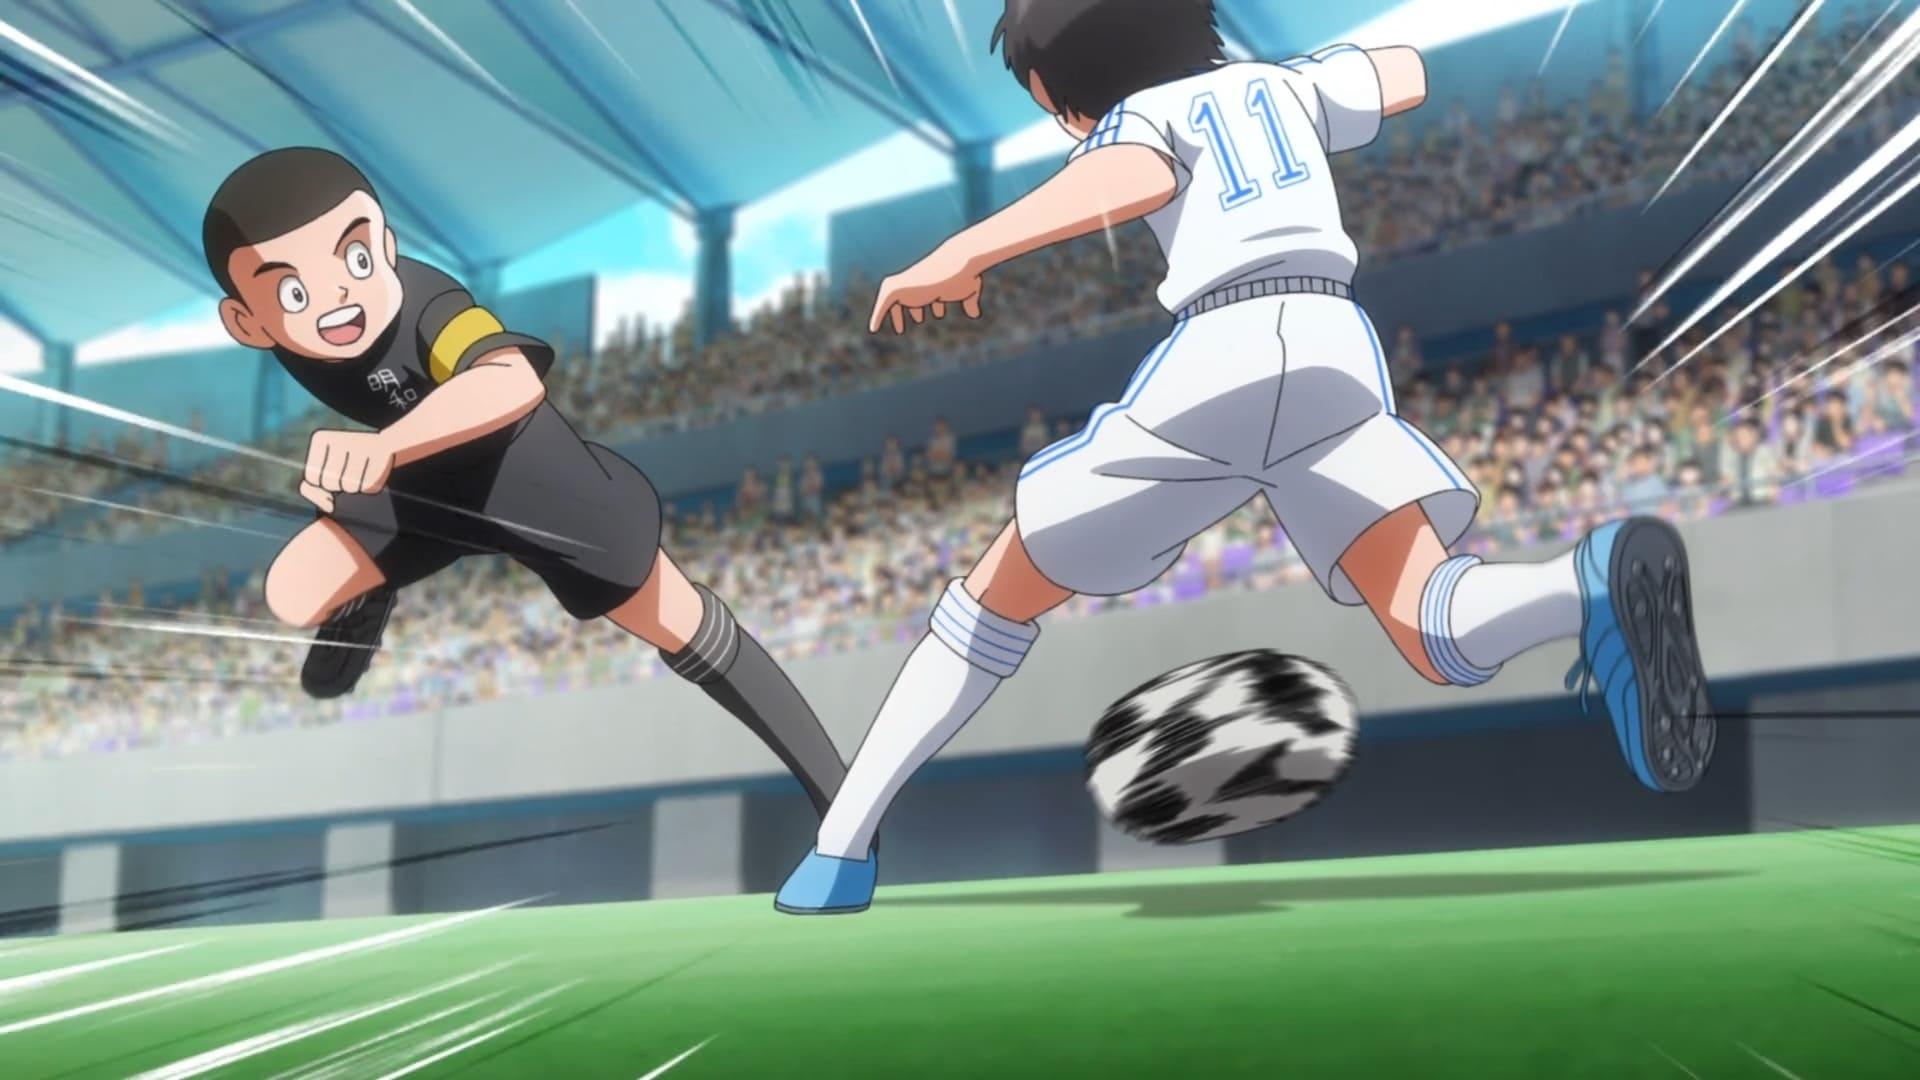 Serie Captain Tsubasa 2018 1 Staffel 14 Folge Deutsch